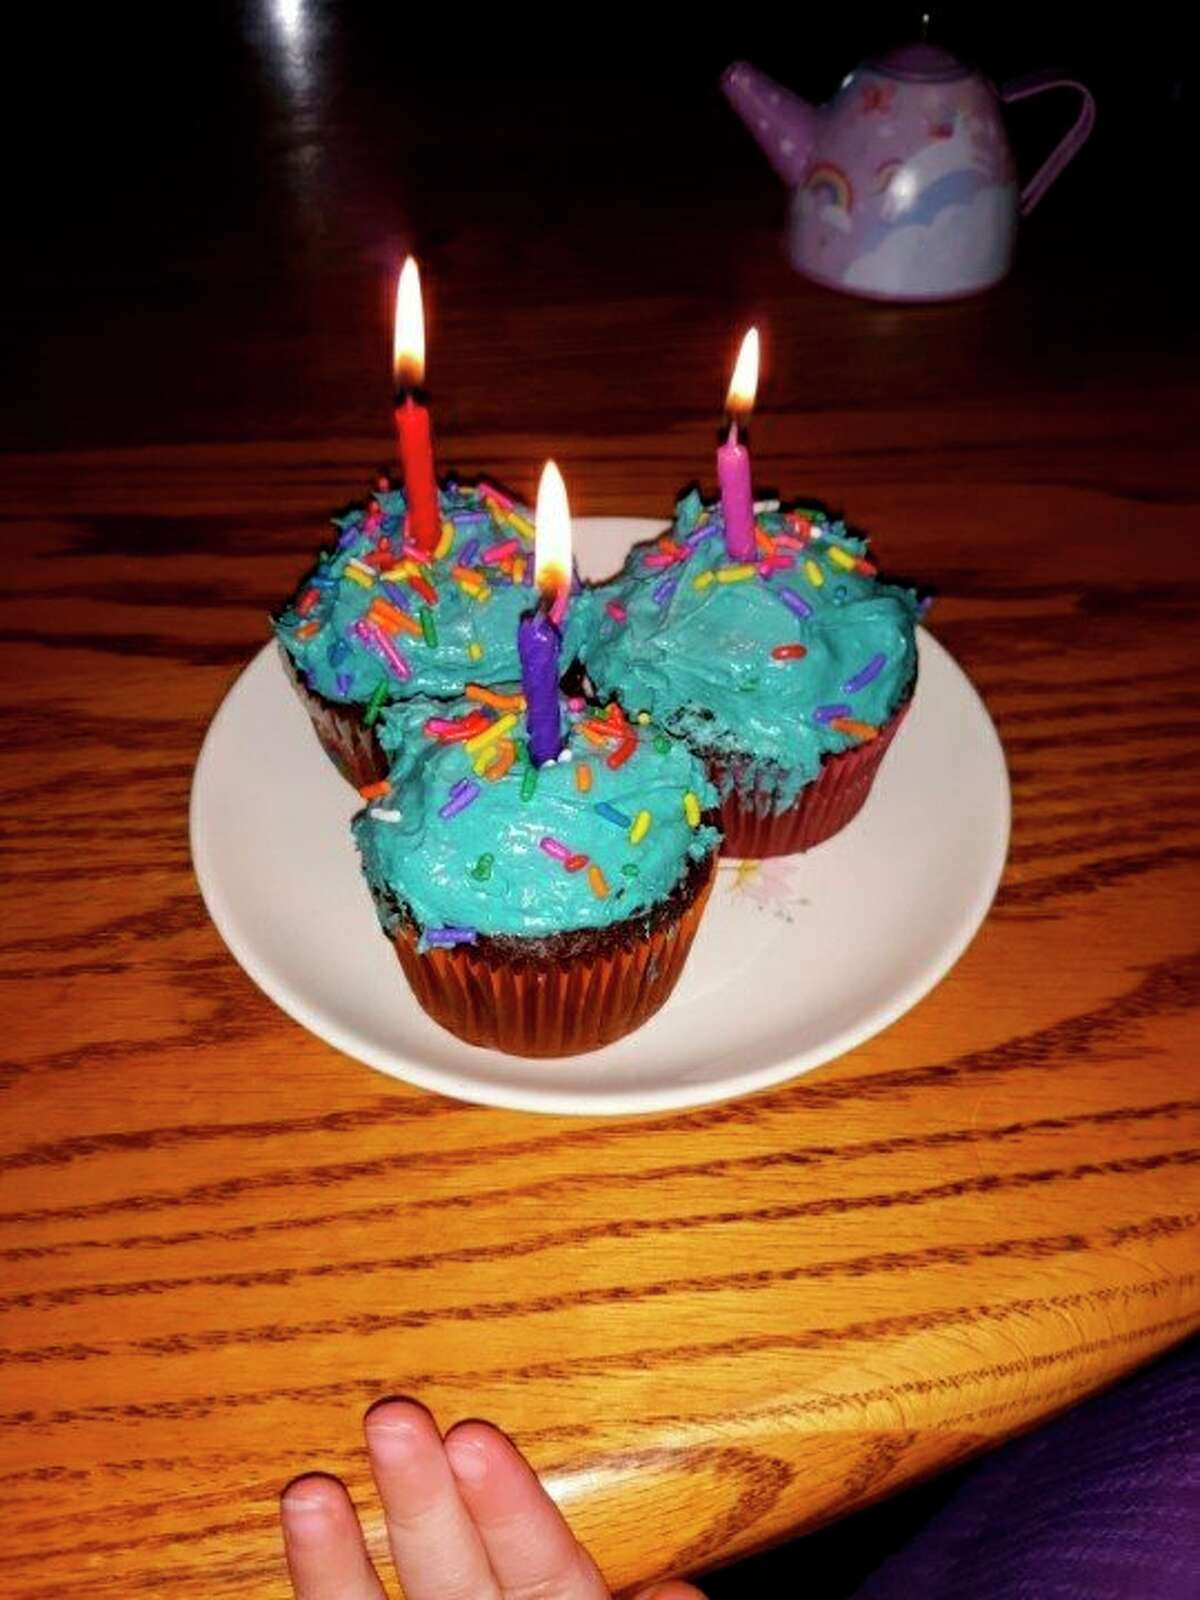 Cupcakes made by Lovina's daughter Elizabeth for Jennifer's birthday celebration. (Courtesy photo)